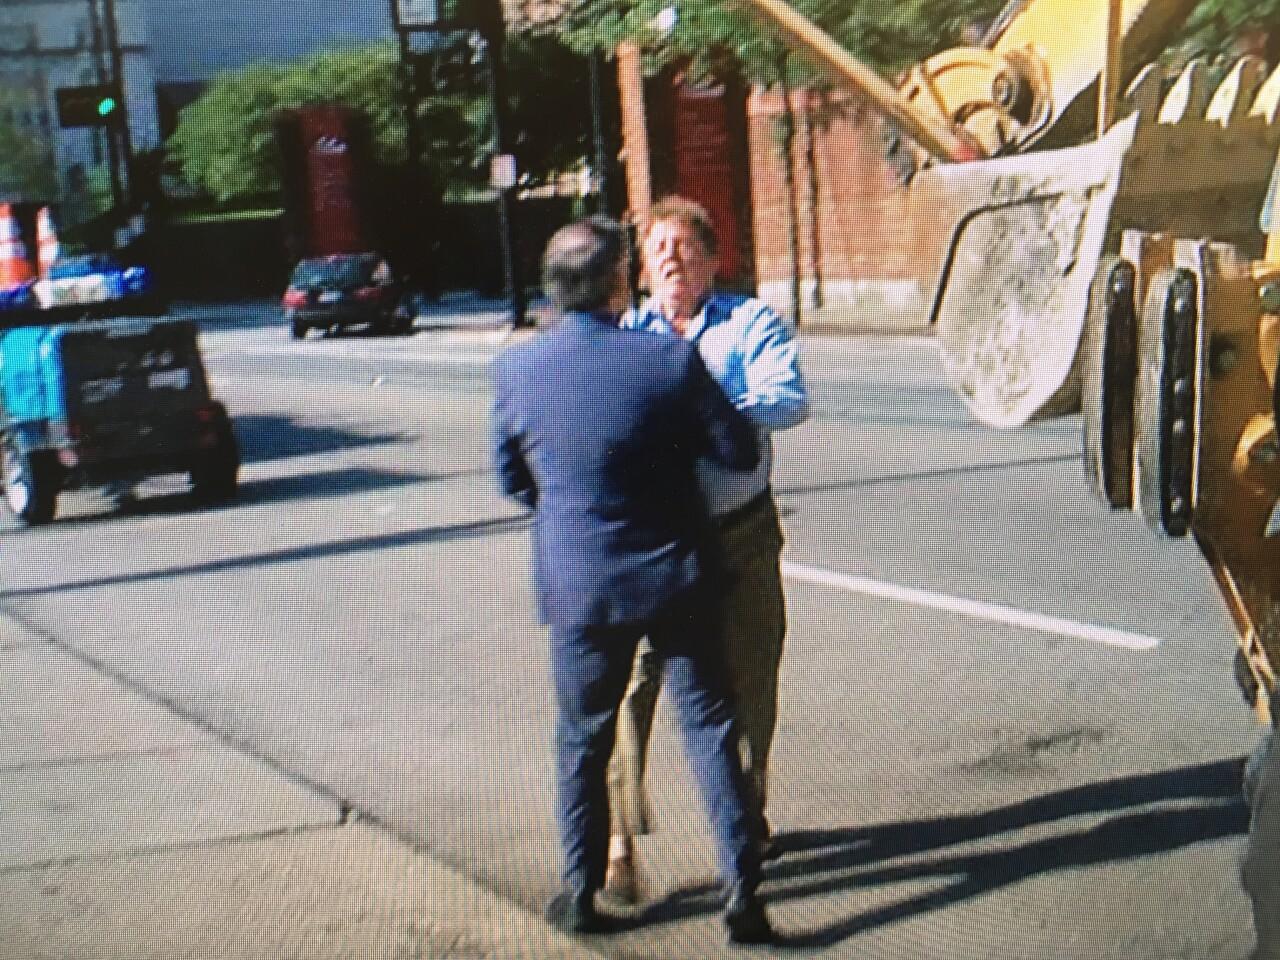 John Klosterman pushes WCPO reporter Craig Cheatham